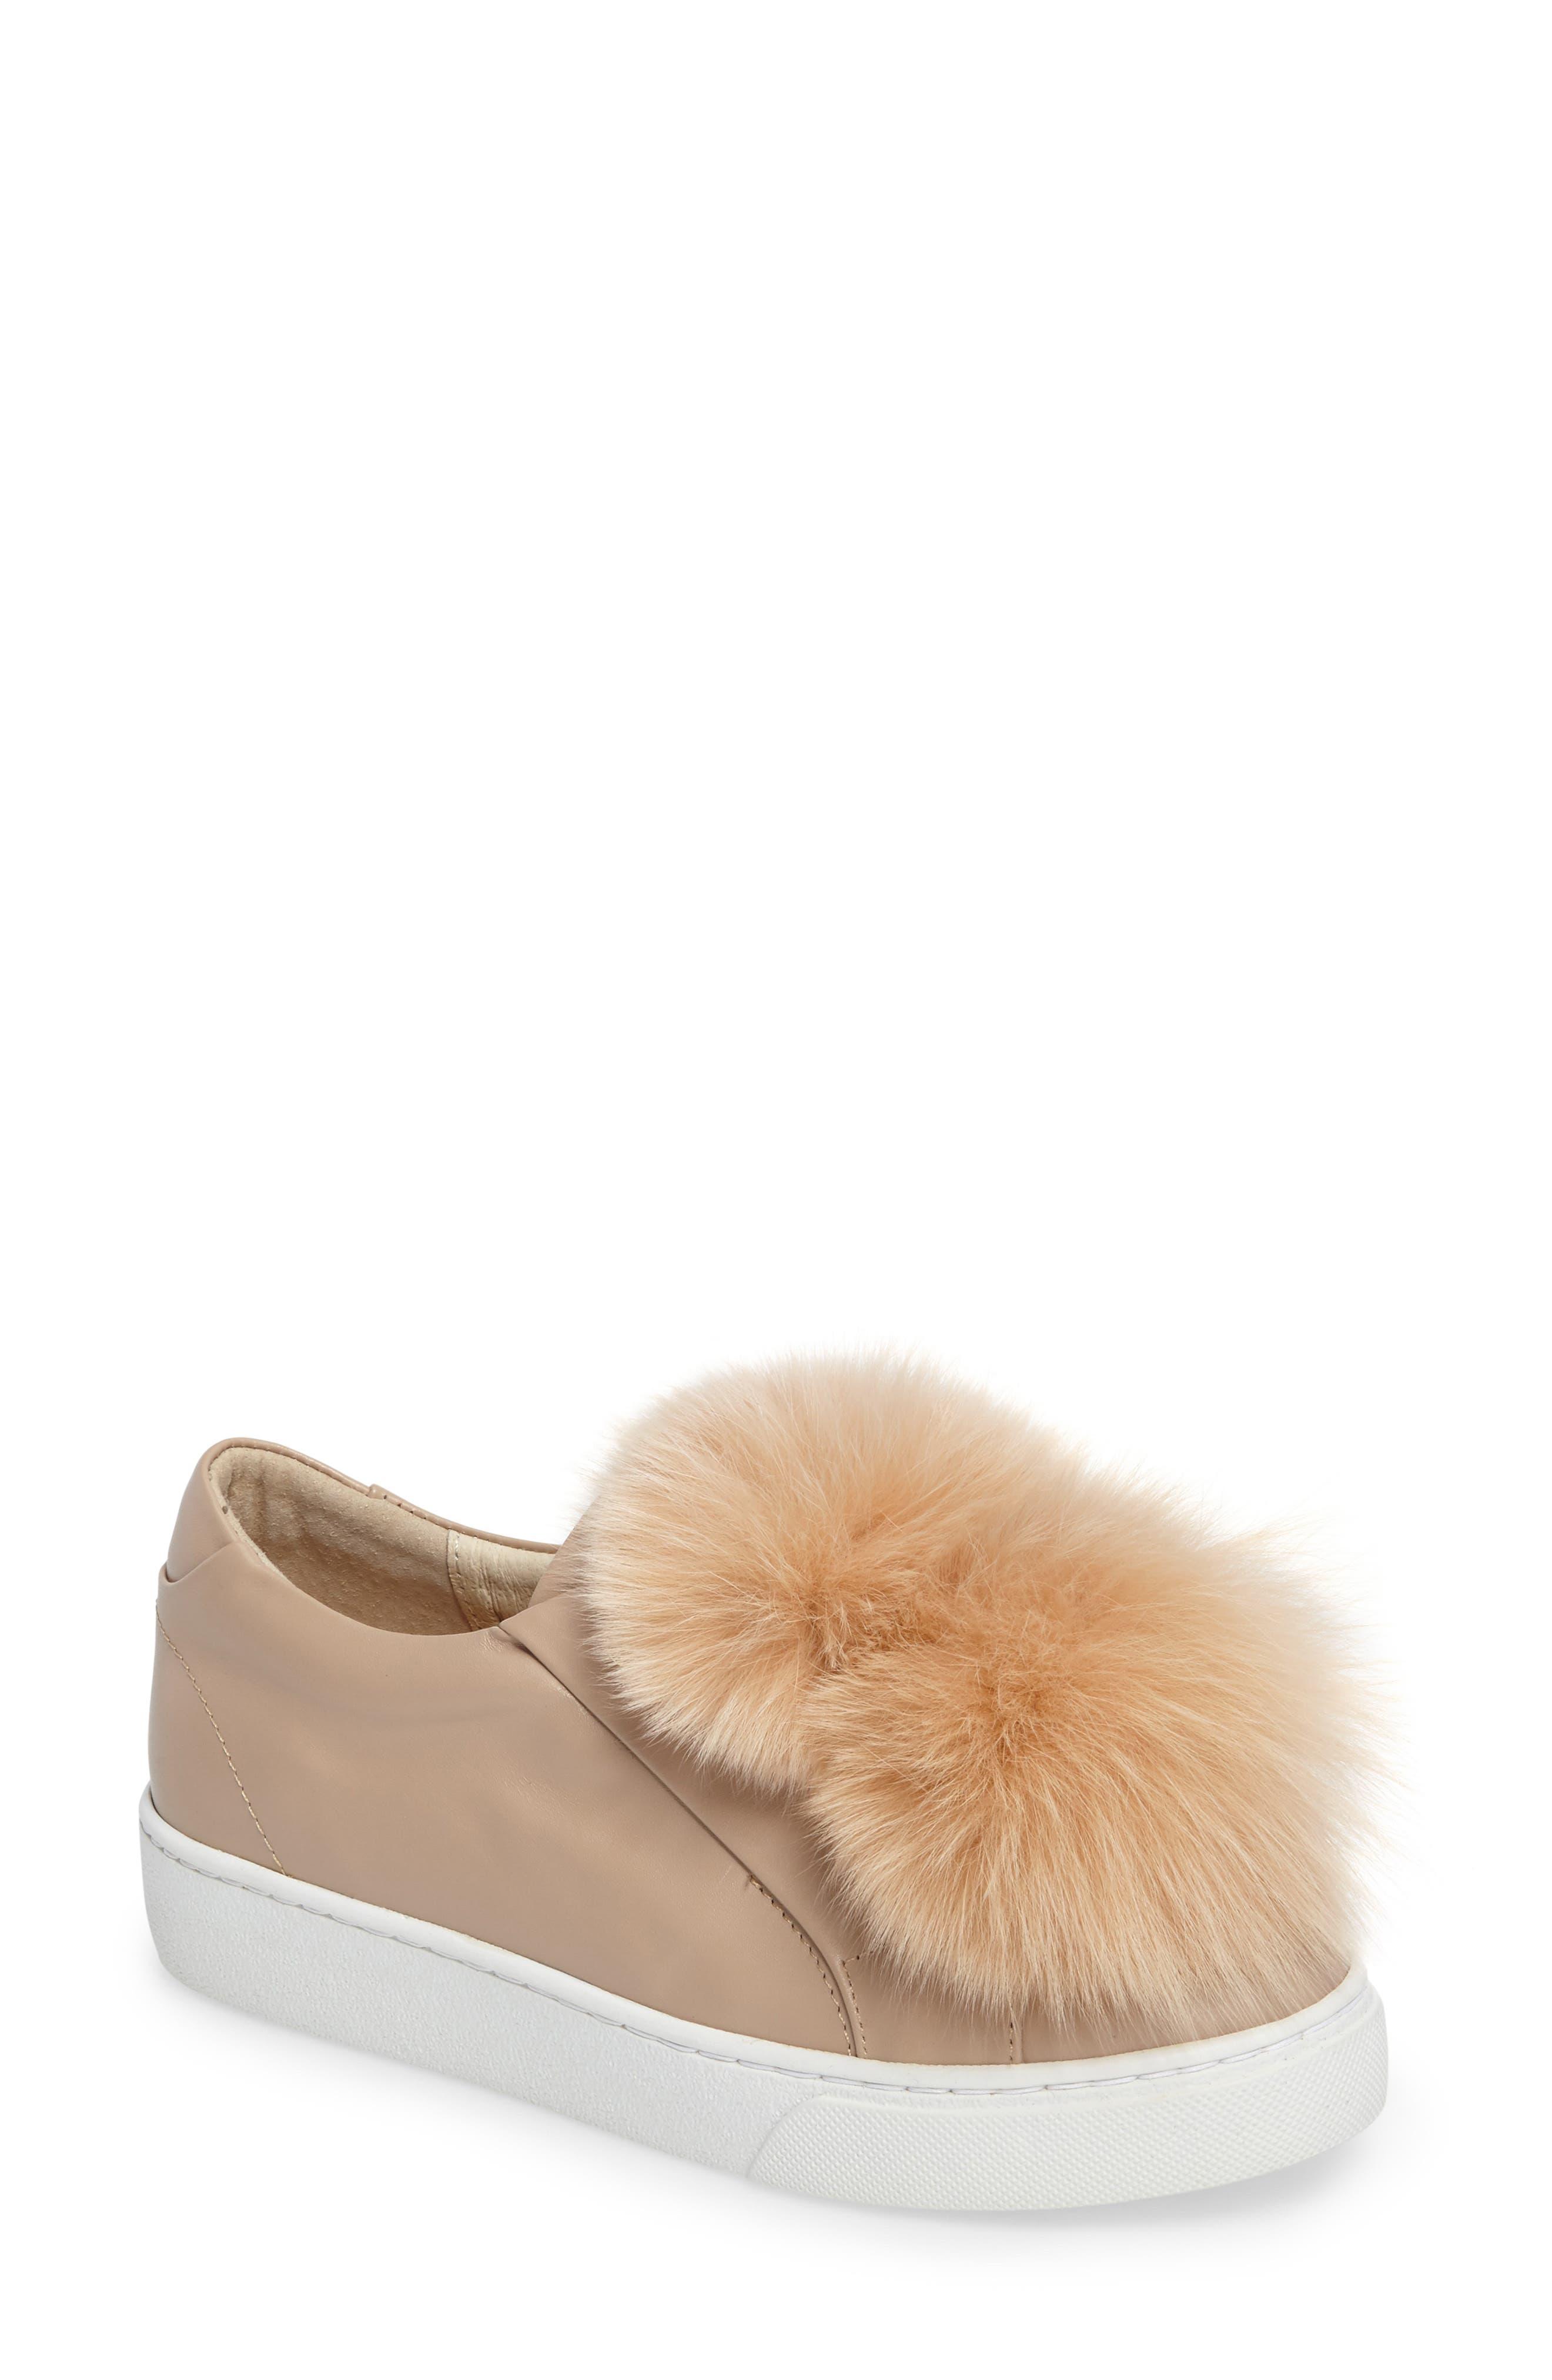 Arian Genuine Fox Fur Trim Sneaker,                             Main thumbnail 1, color,                             250